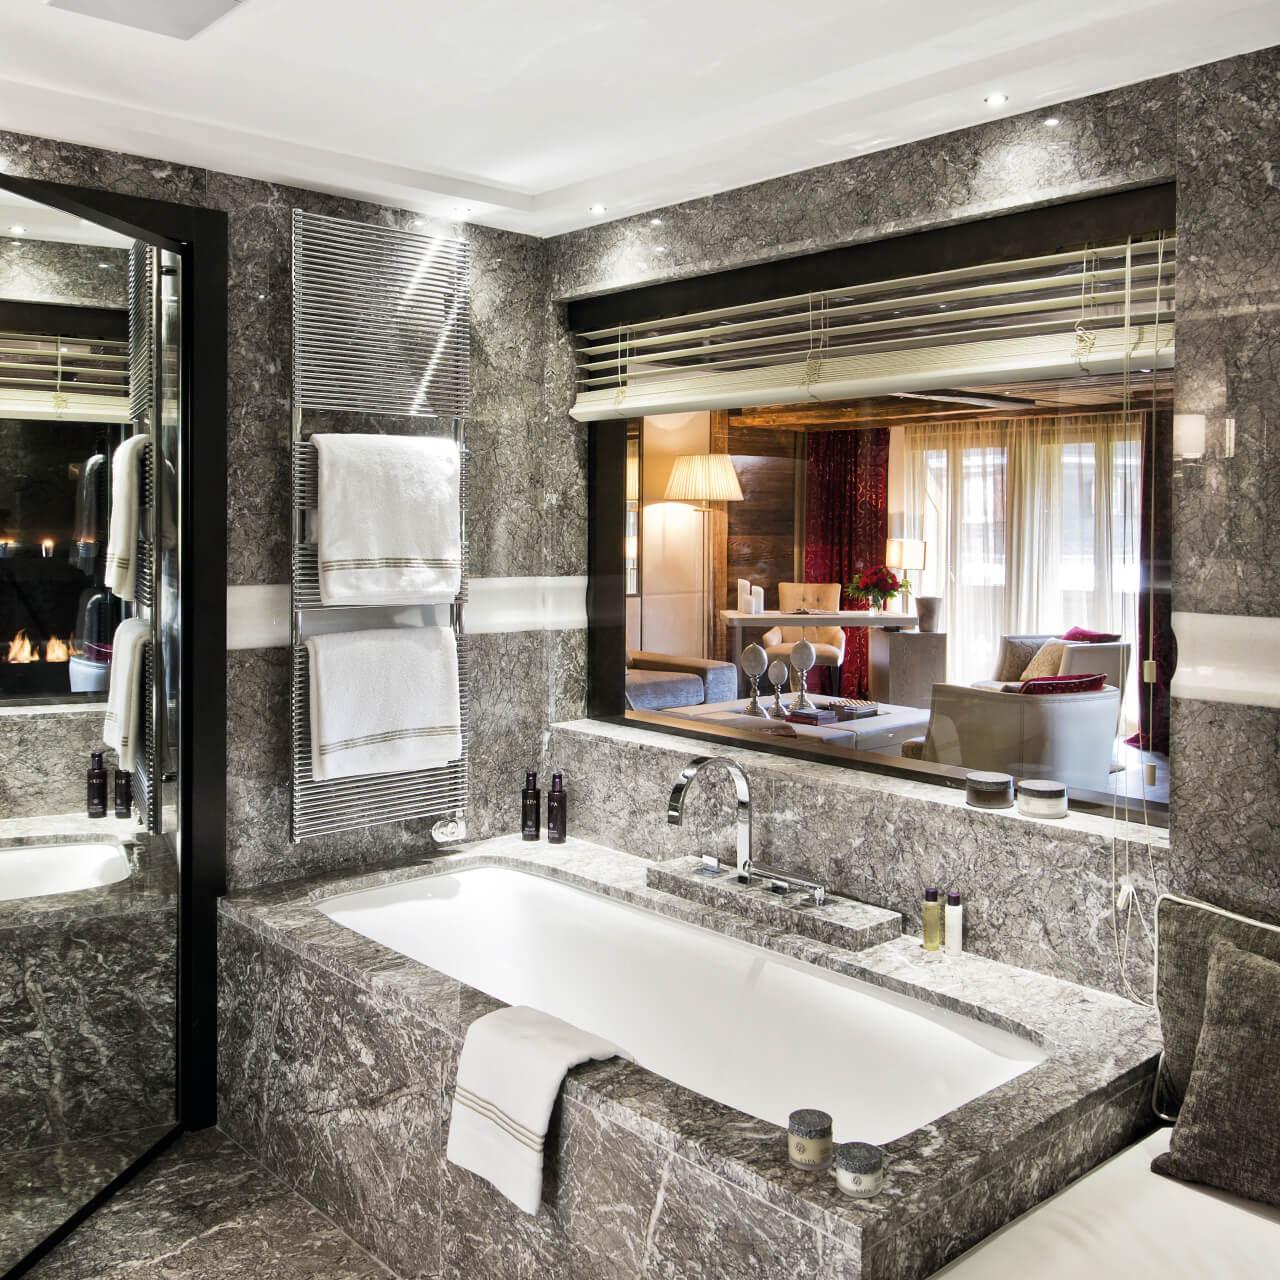 Gstaad-Saanen-Bathroom